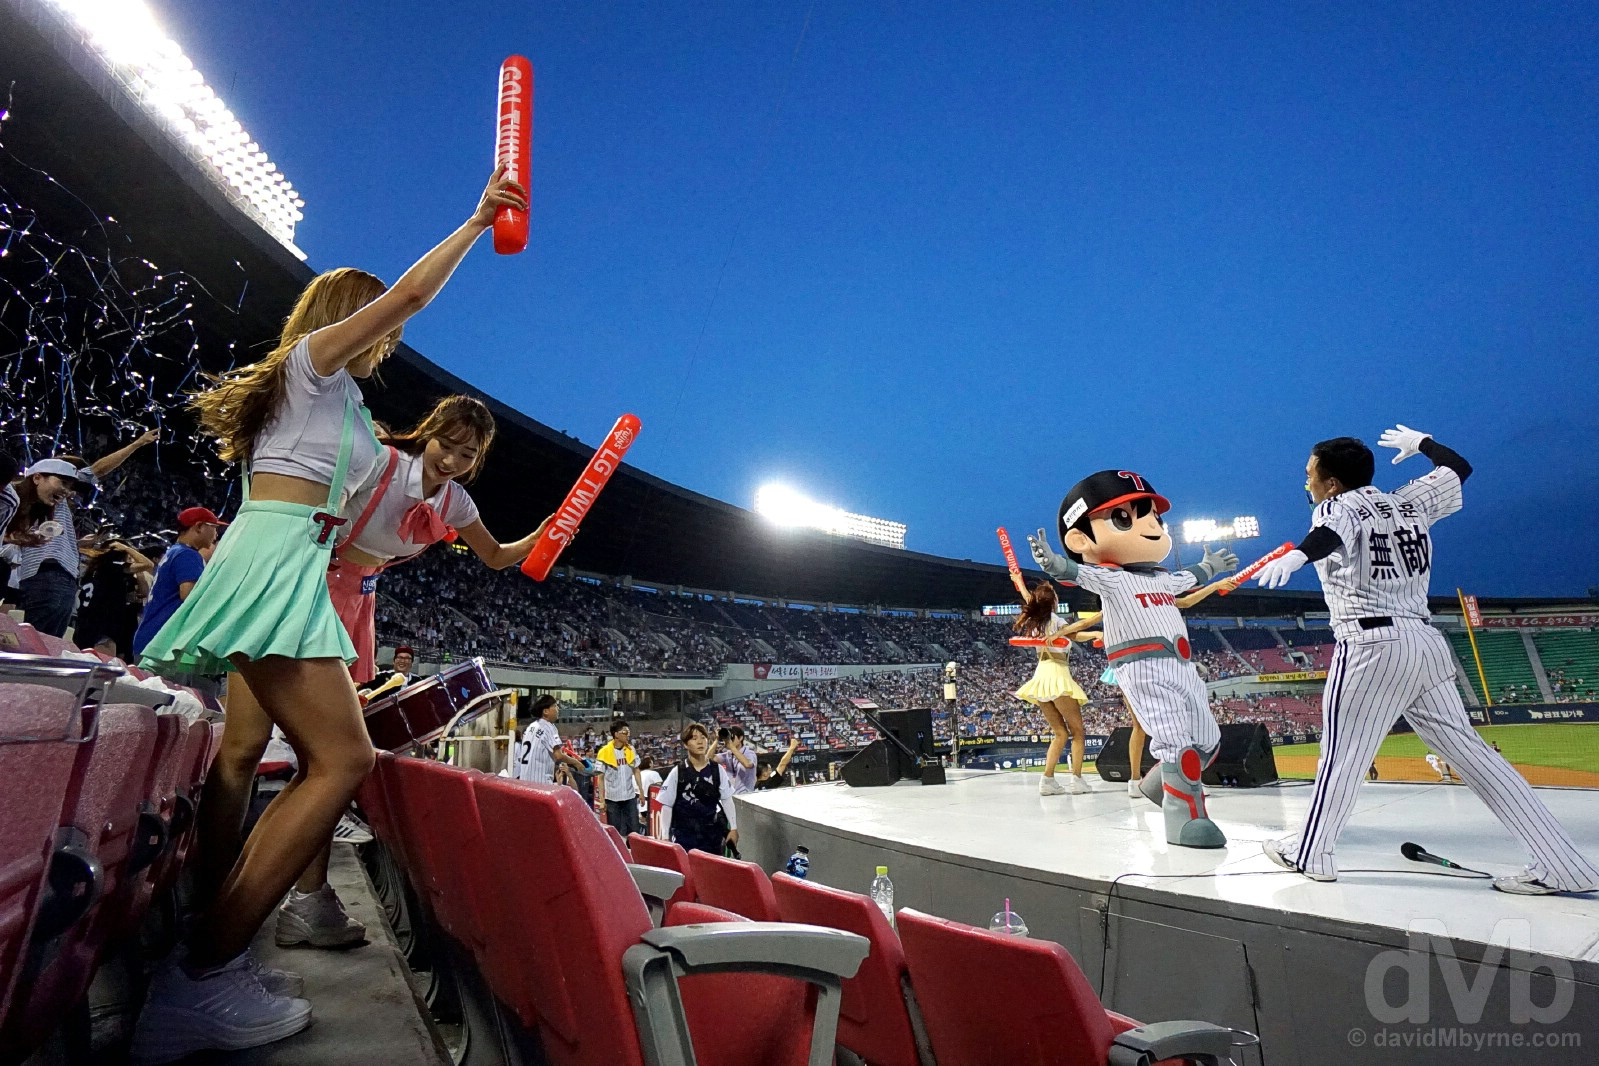 Grand slam time at Jamsil Stadium, Seoul, South Korea. August 3, 2017.